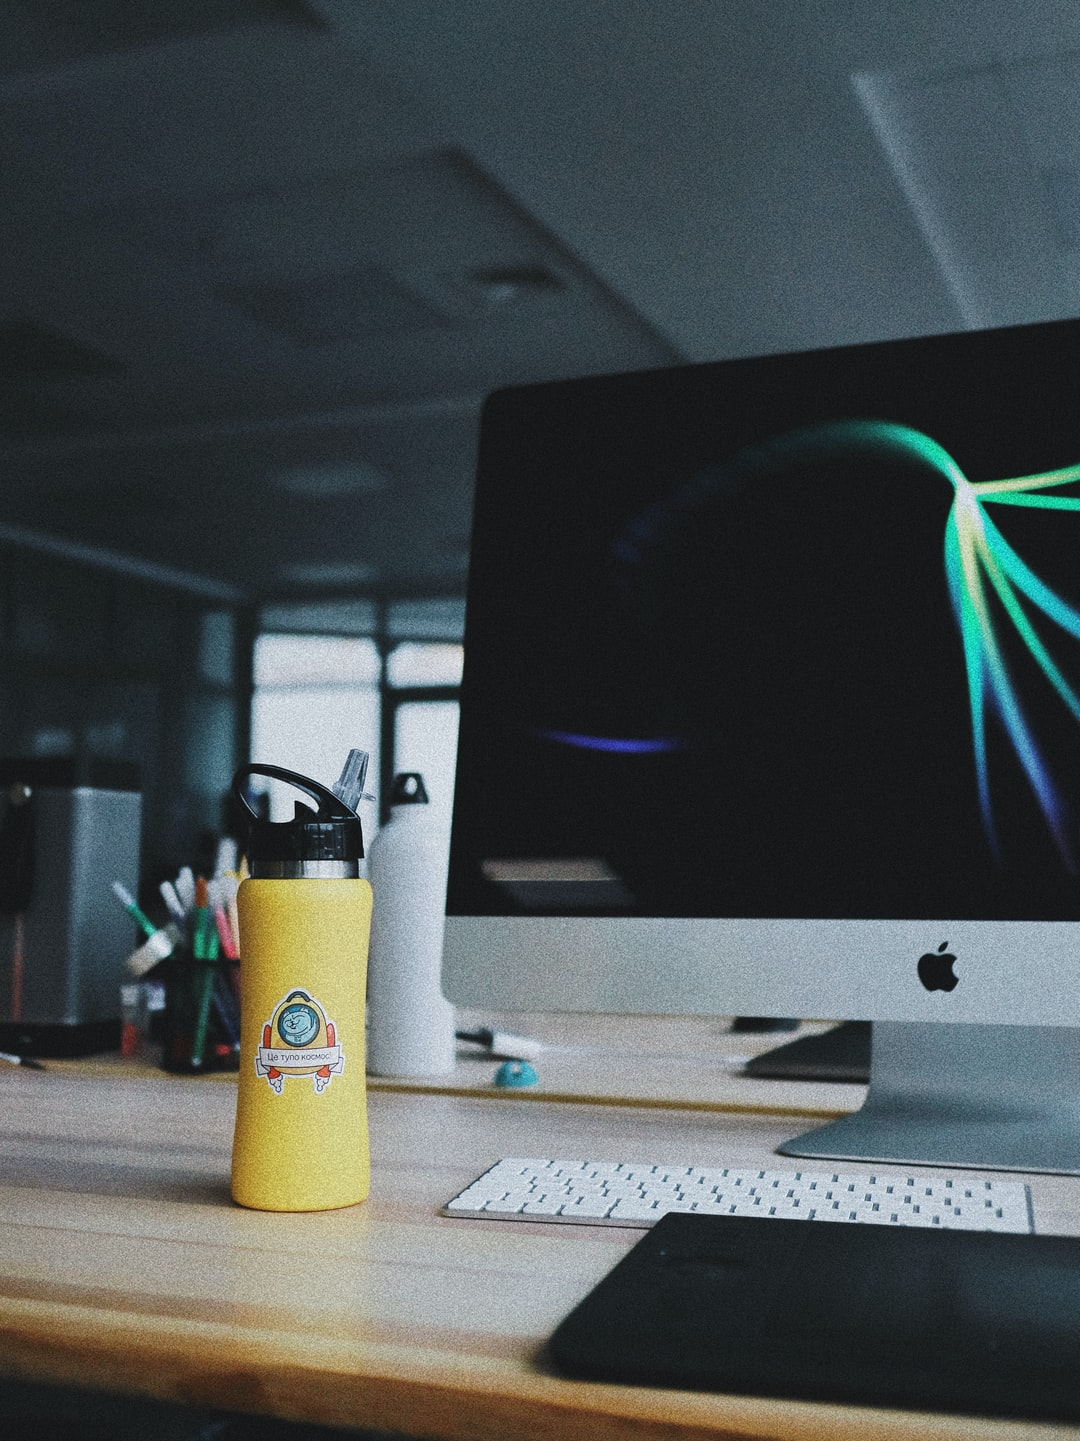 Imac, mac, computer and lifestyle HD photo by Olena Sergienko (@olenkasergienko) on Unsplash